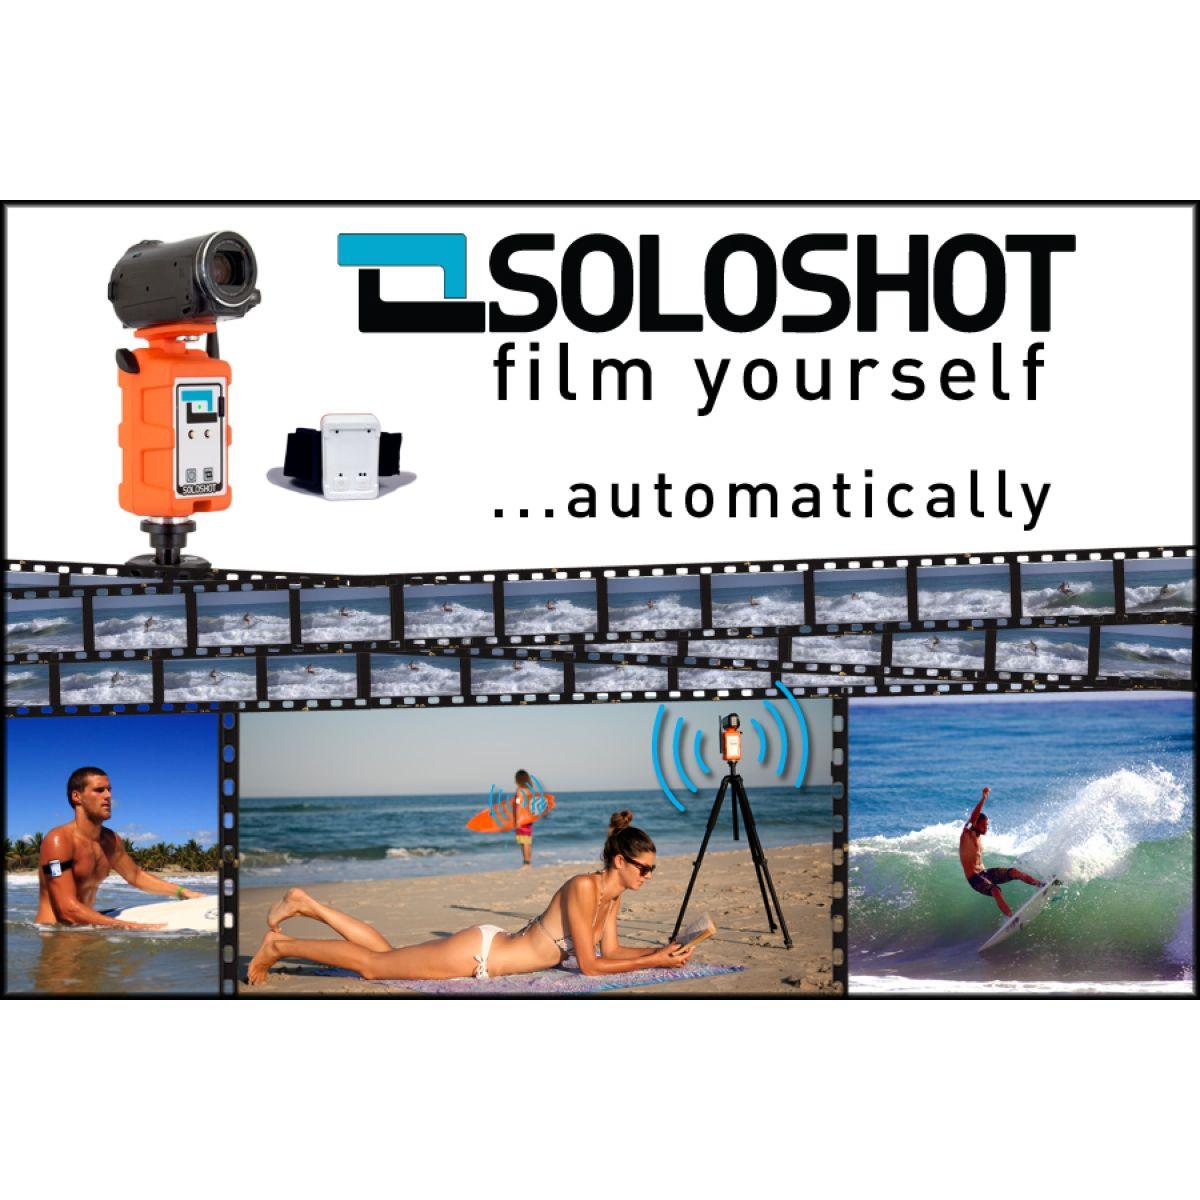 SOLOSHOT2: http://goo.gl/UX8W03, #SoloShot2 #Soloshot #filmyourself #robotcamera #robotcameraman #videopic.twitter.com/r6j01G7hNz